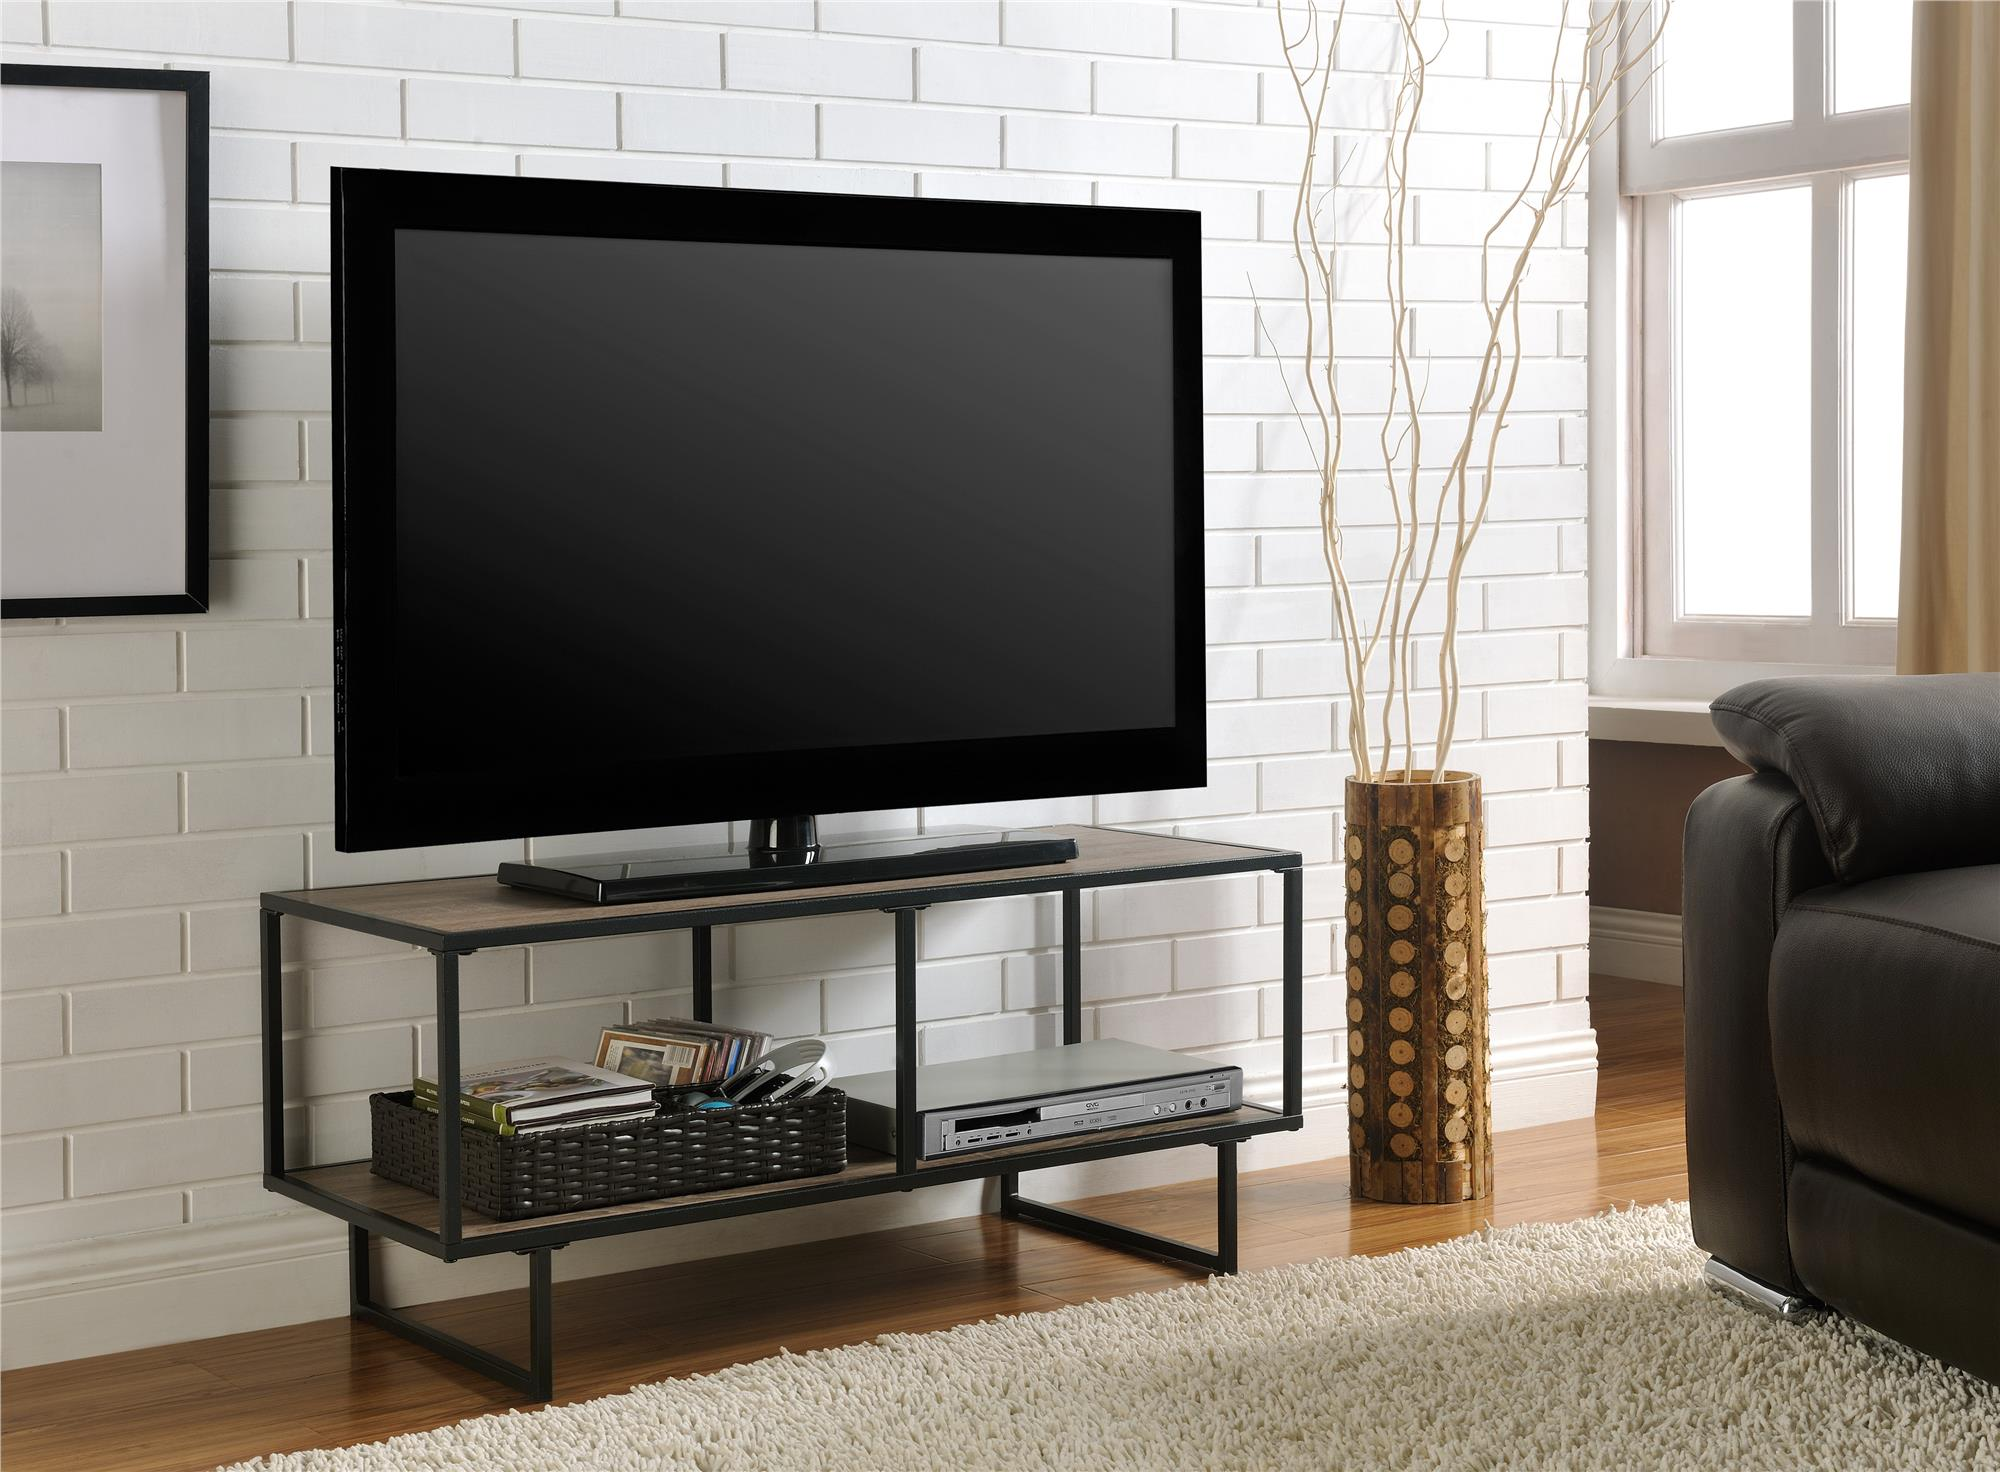 Emmett Sonoma Tv Stand Coffee Table With Metal Frame For Tvs Up To 42 Oak Gunmetal Gray Walmart Com Walmart Com